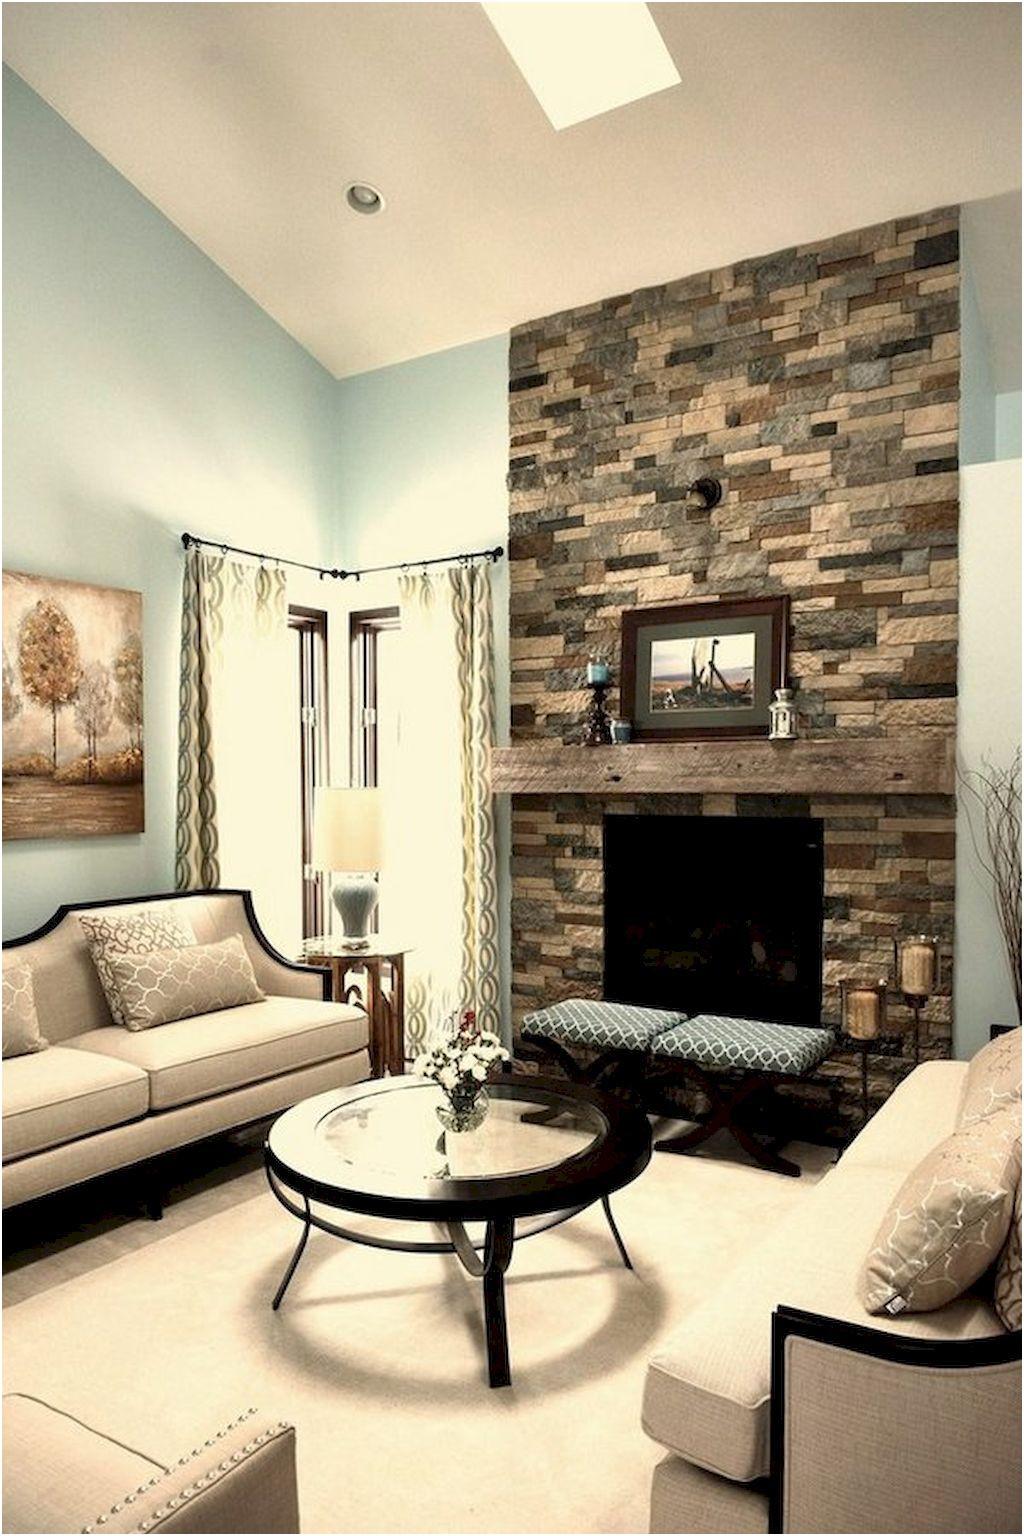 Fireplace Decor Ideas Luxury 70 Gorgeous Apartment Fireplace Decorating Ideas